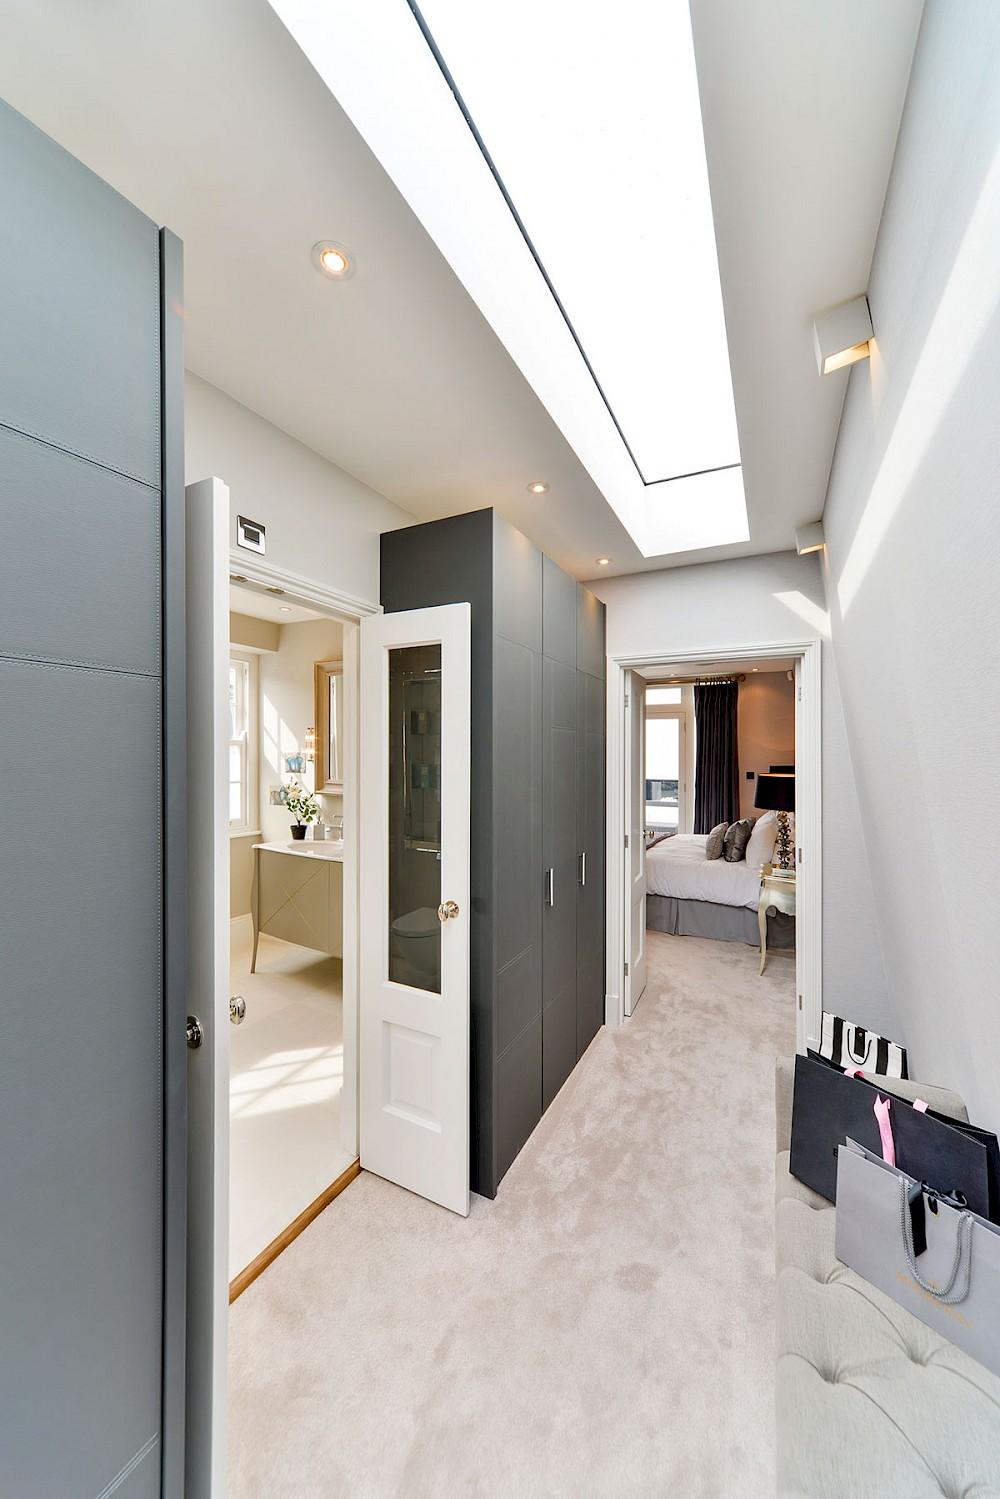 Bedroom refurbishment complete with dressing room